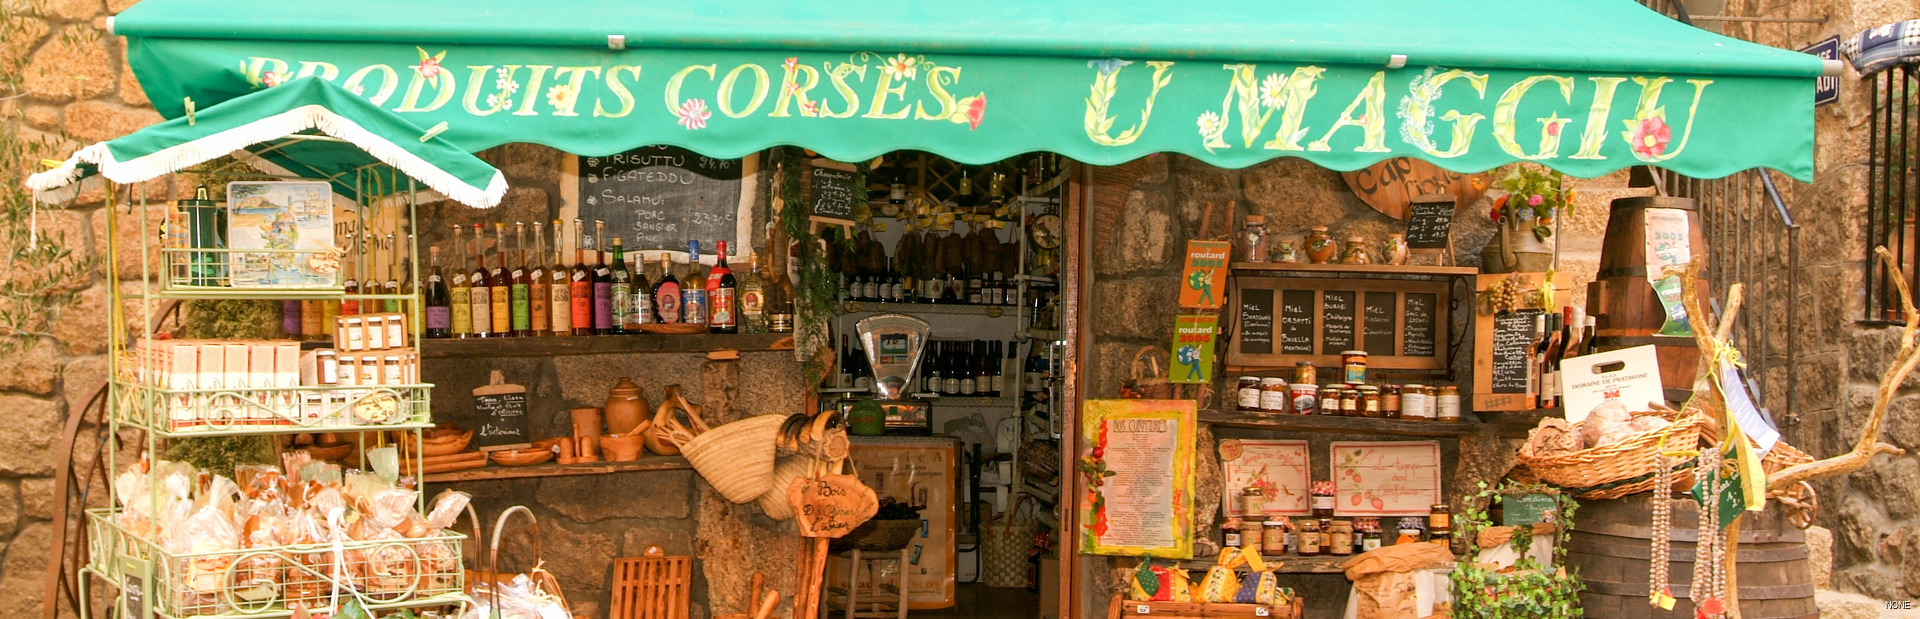 Corsica news photo